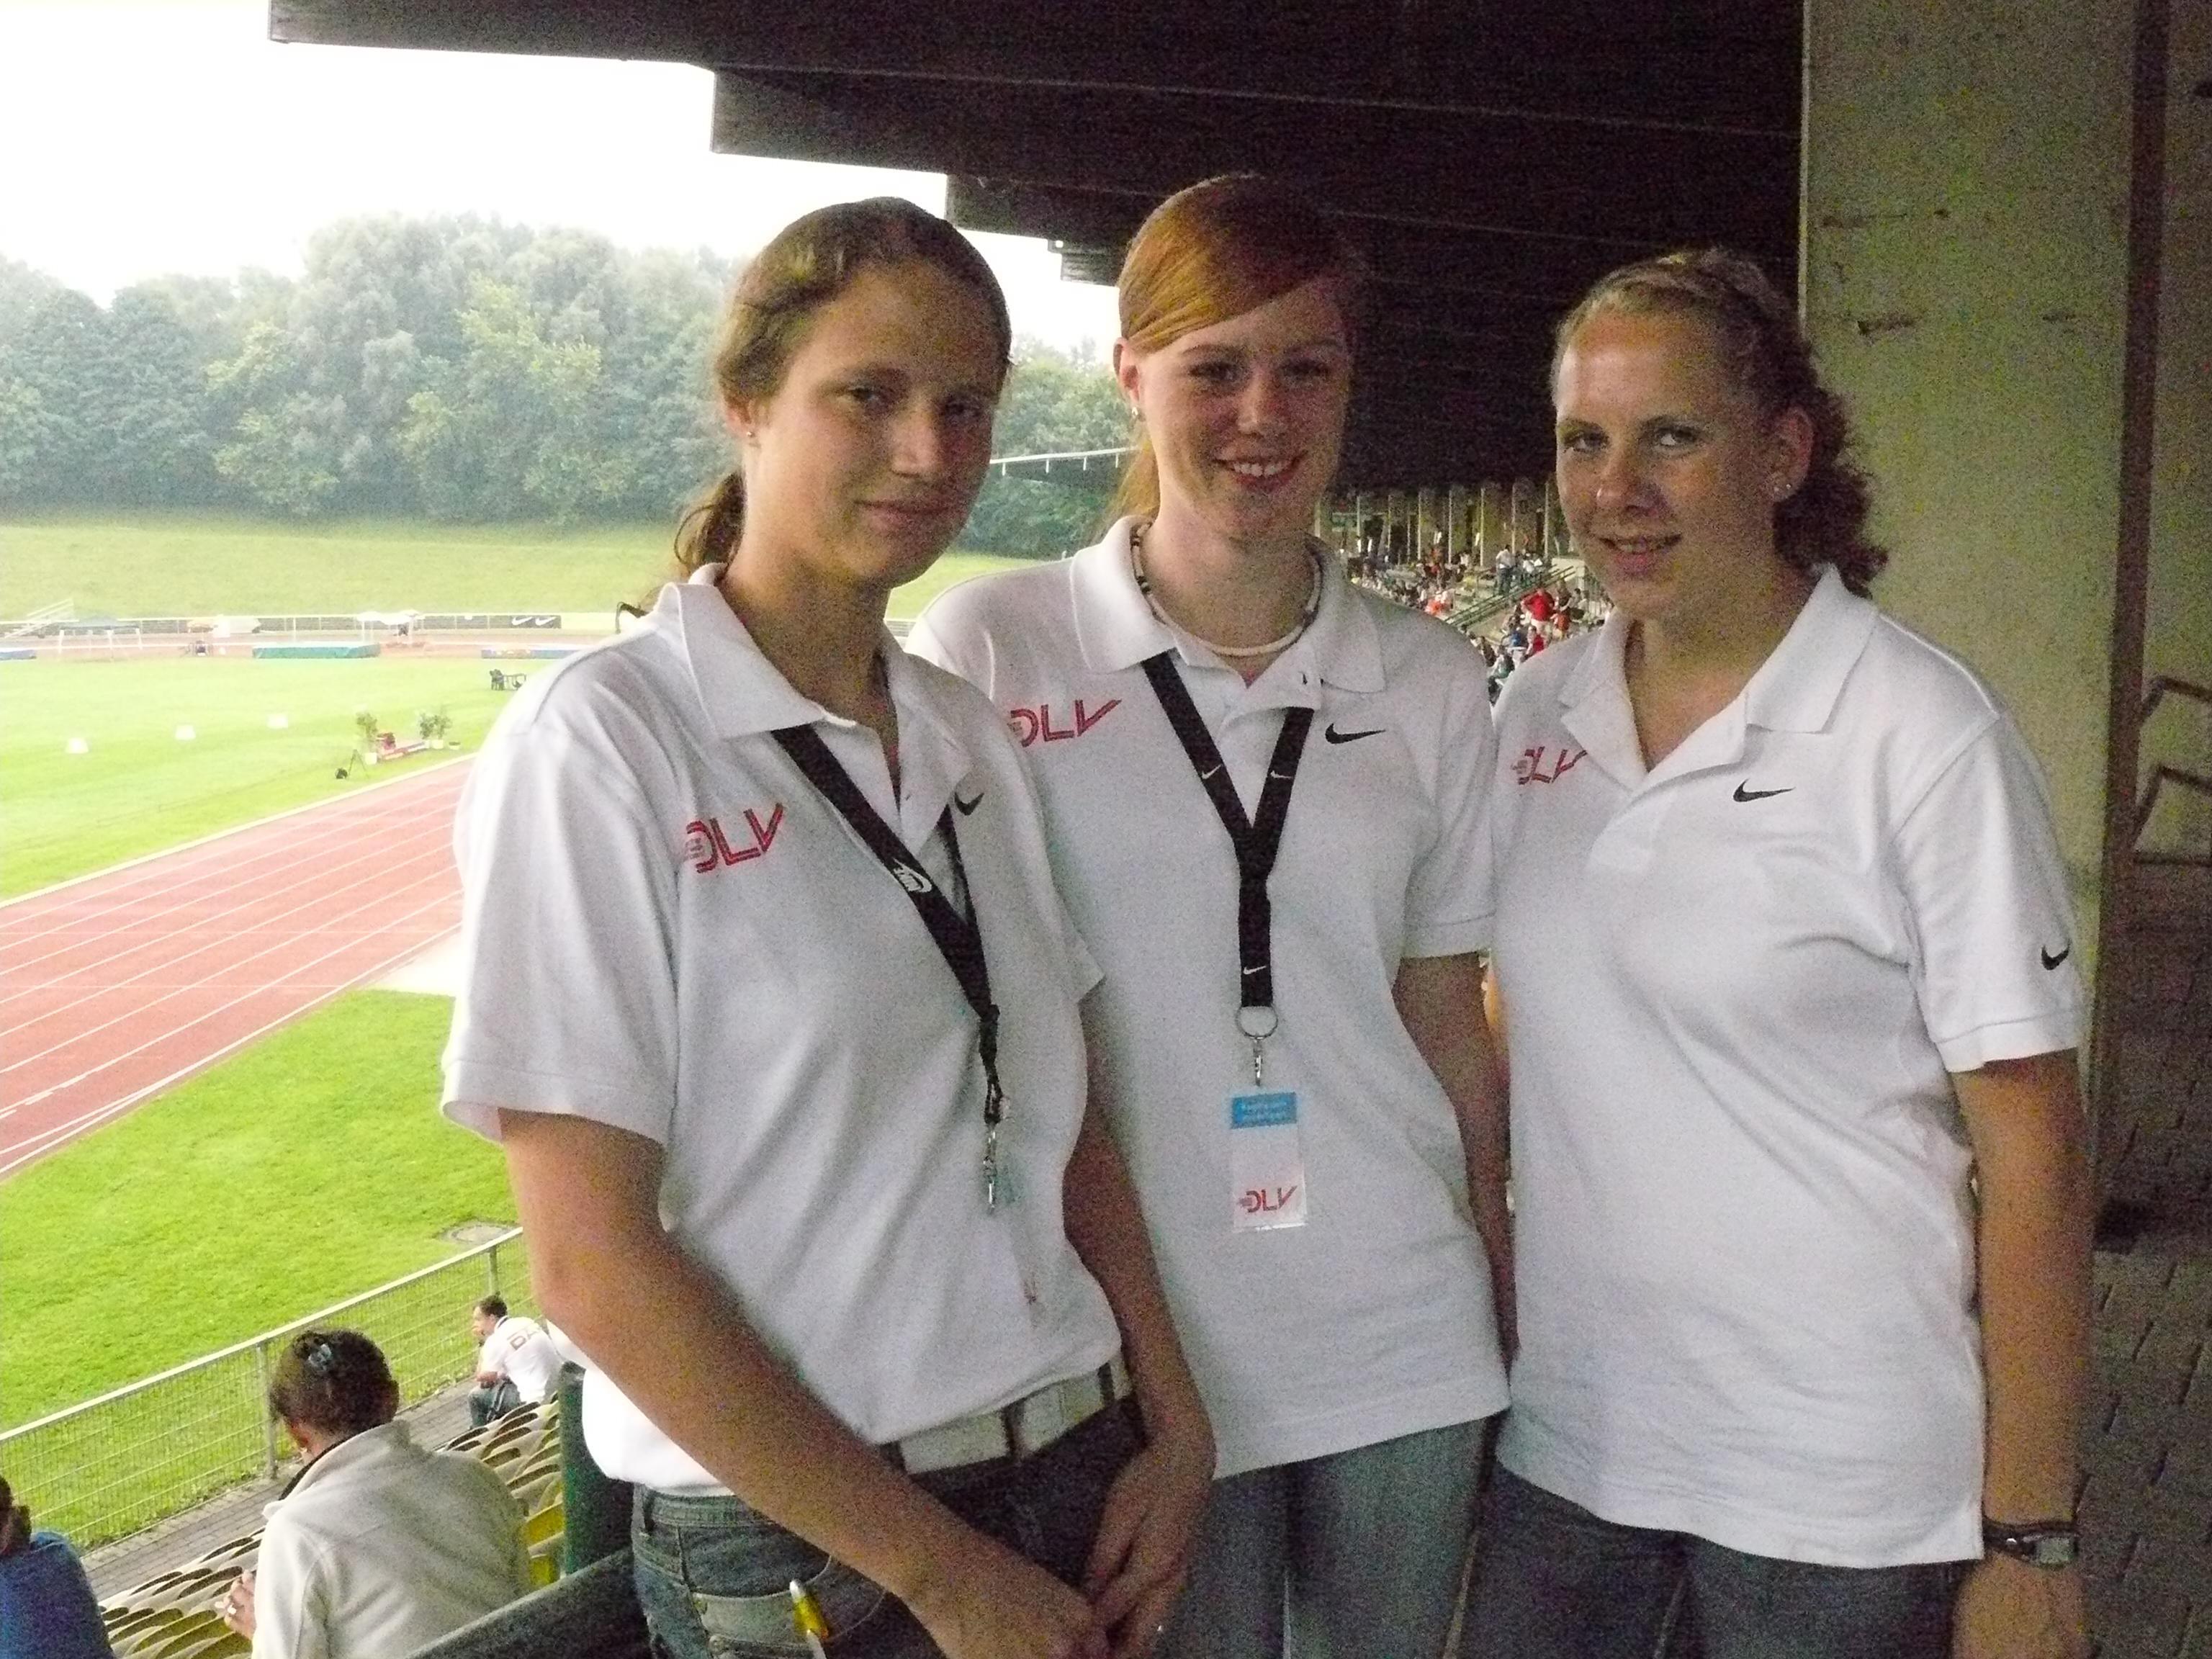 2008.07.27. - 10.03 - Claudia,Kira,Ines